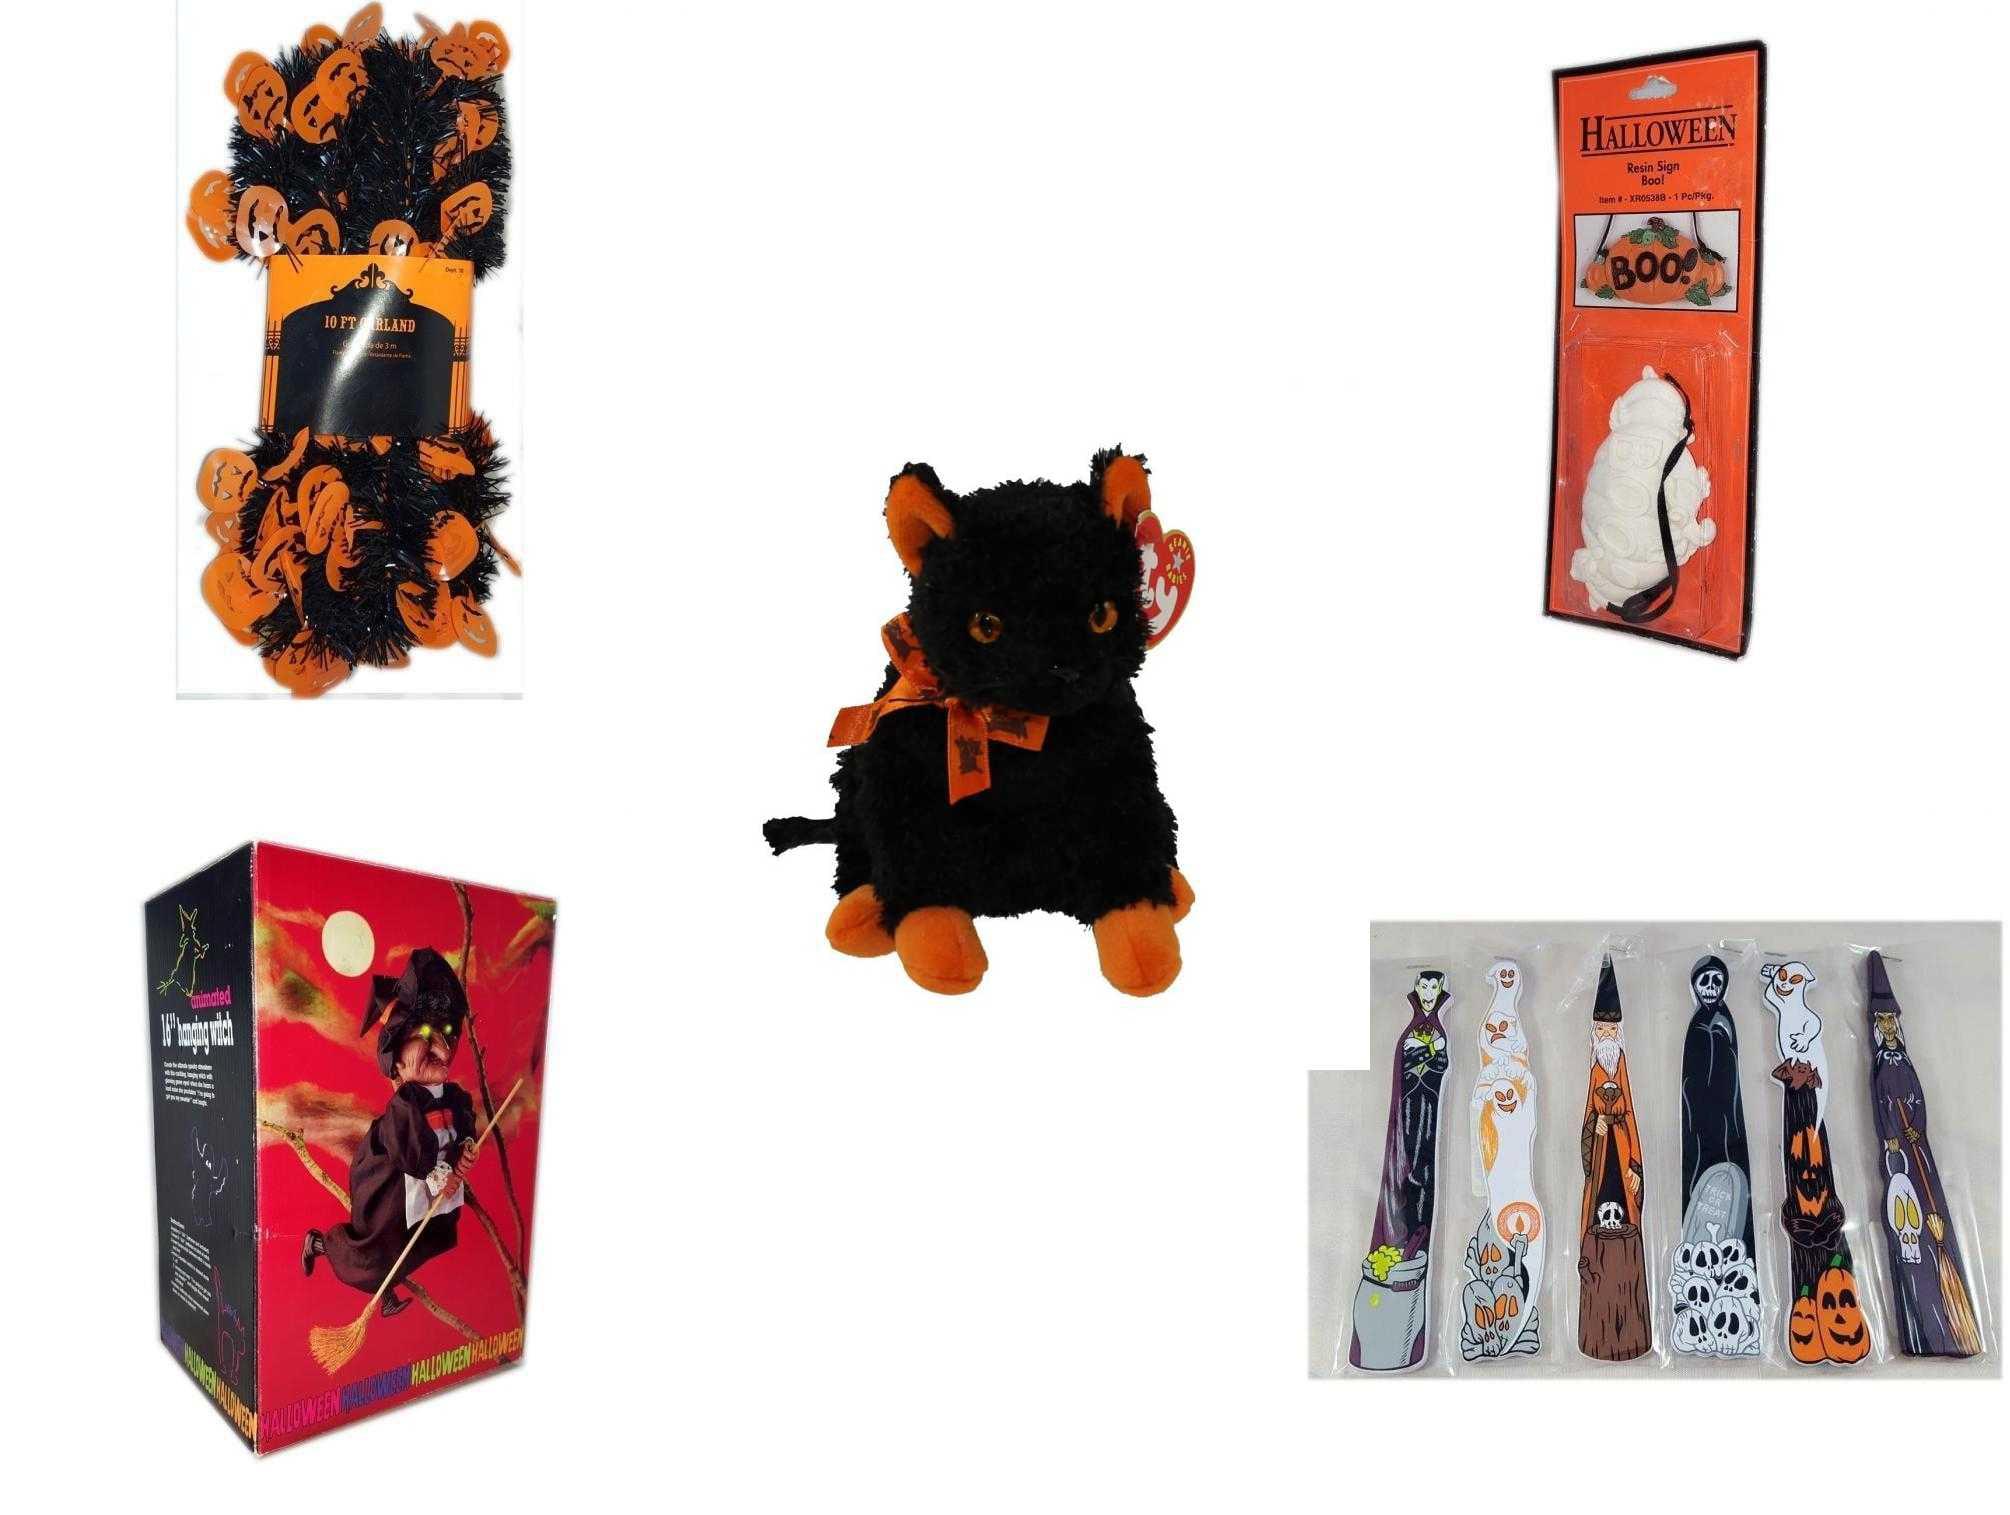 Halloween Fun Gift Bundle 5 Piece Black Orange Pumpkin Garland 10 Ft Resin Boo Sign Ty Beanie Baby Fraidy The Black Orange Cat Animated 16 Hanging Witch